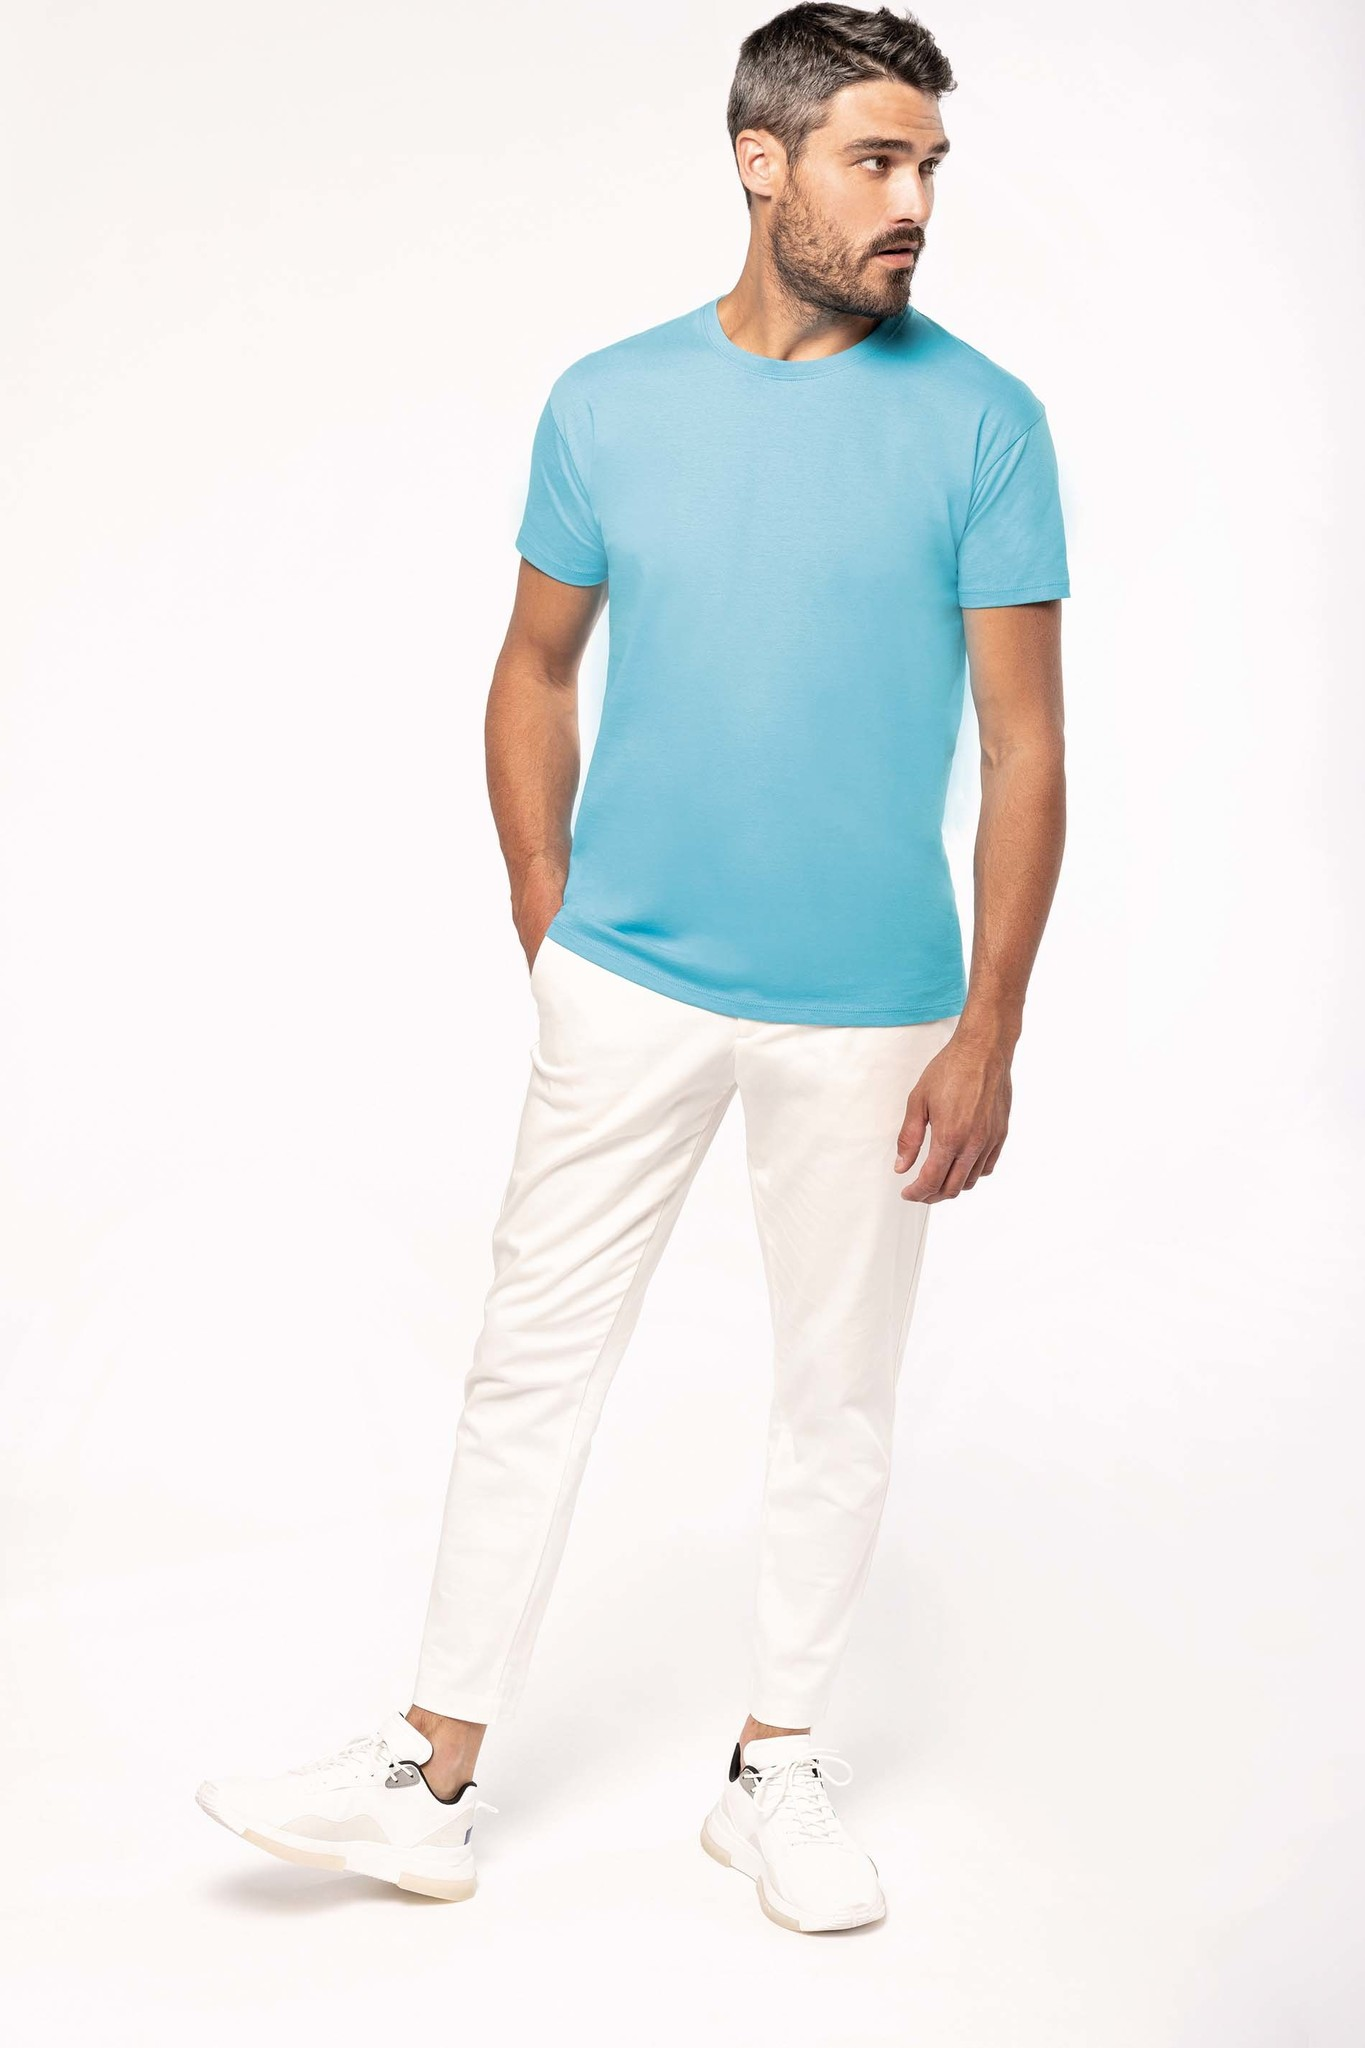 Eco-Friendly Unisex T-shirt -Lightsand